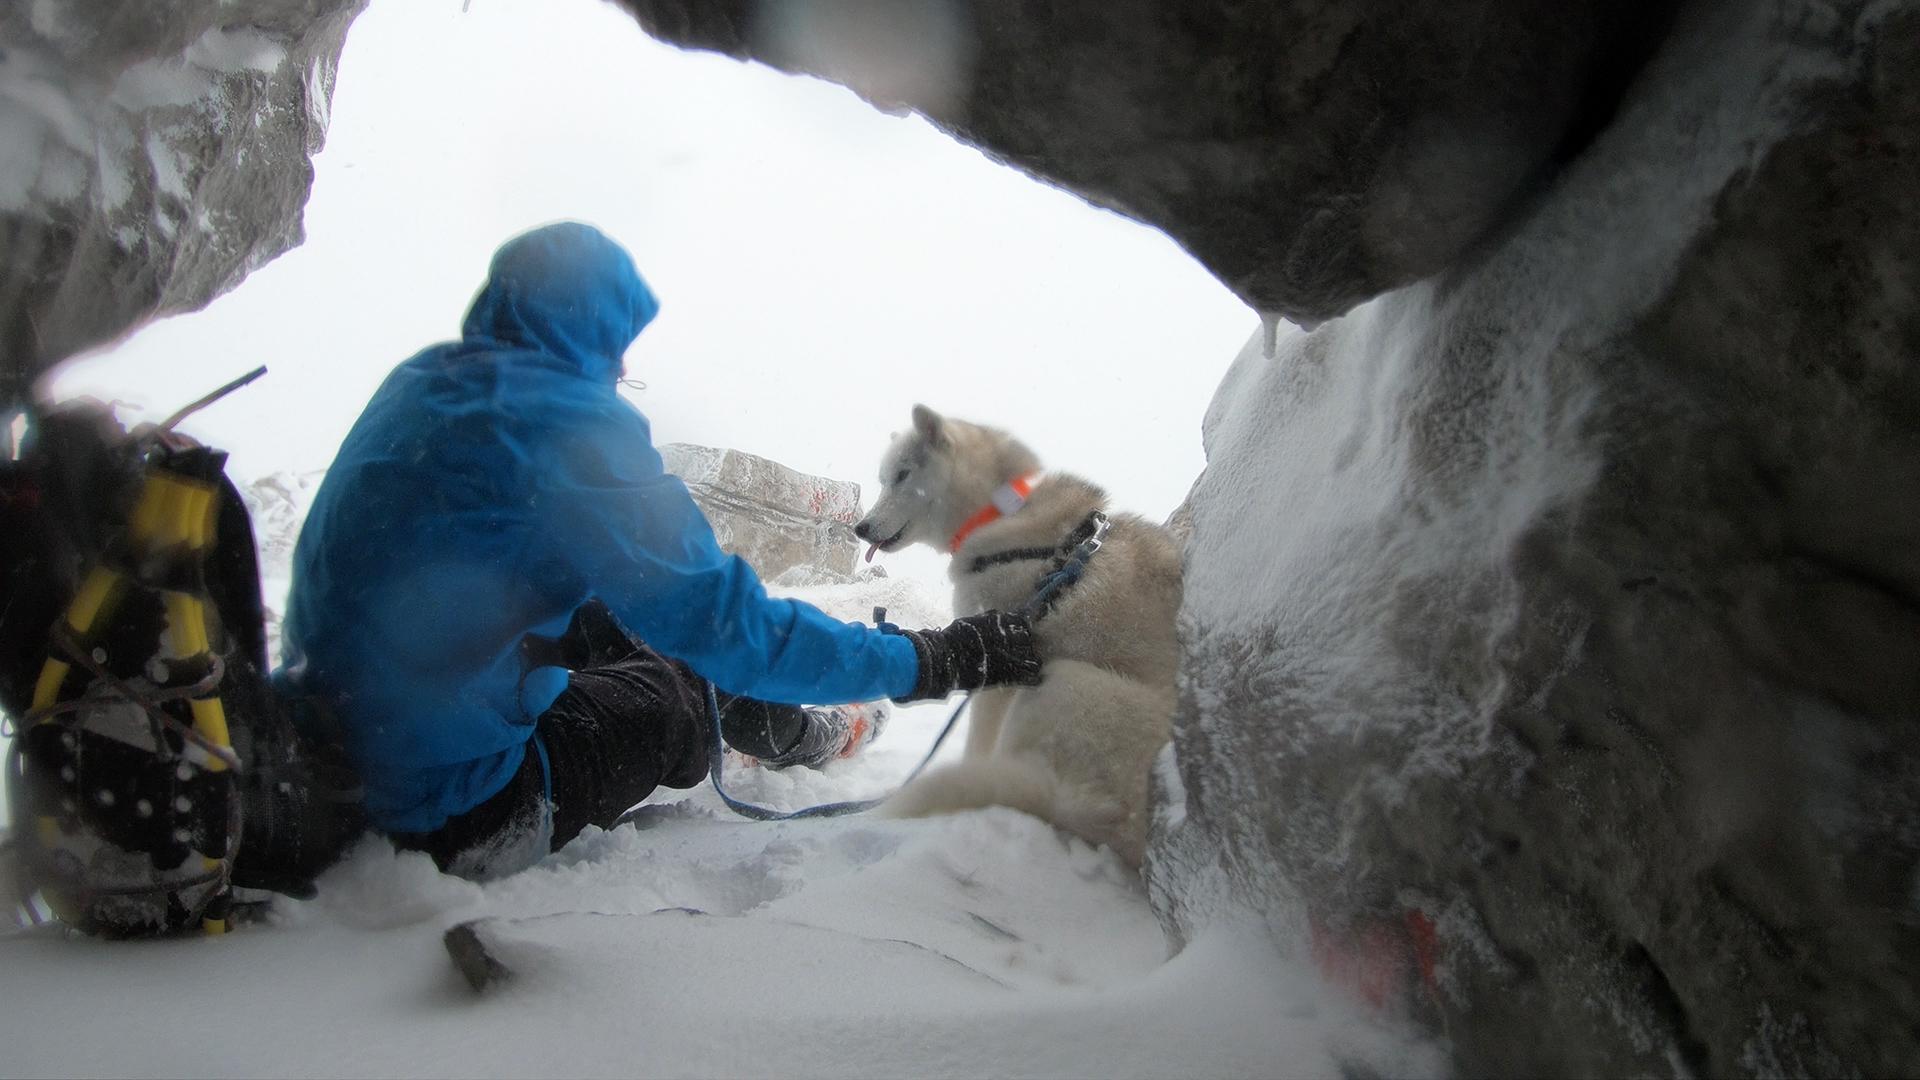 Risnjak Winter Croatia Hiking.jpg (1.05 MB)